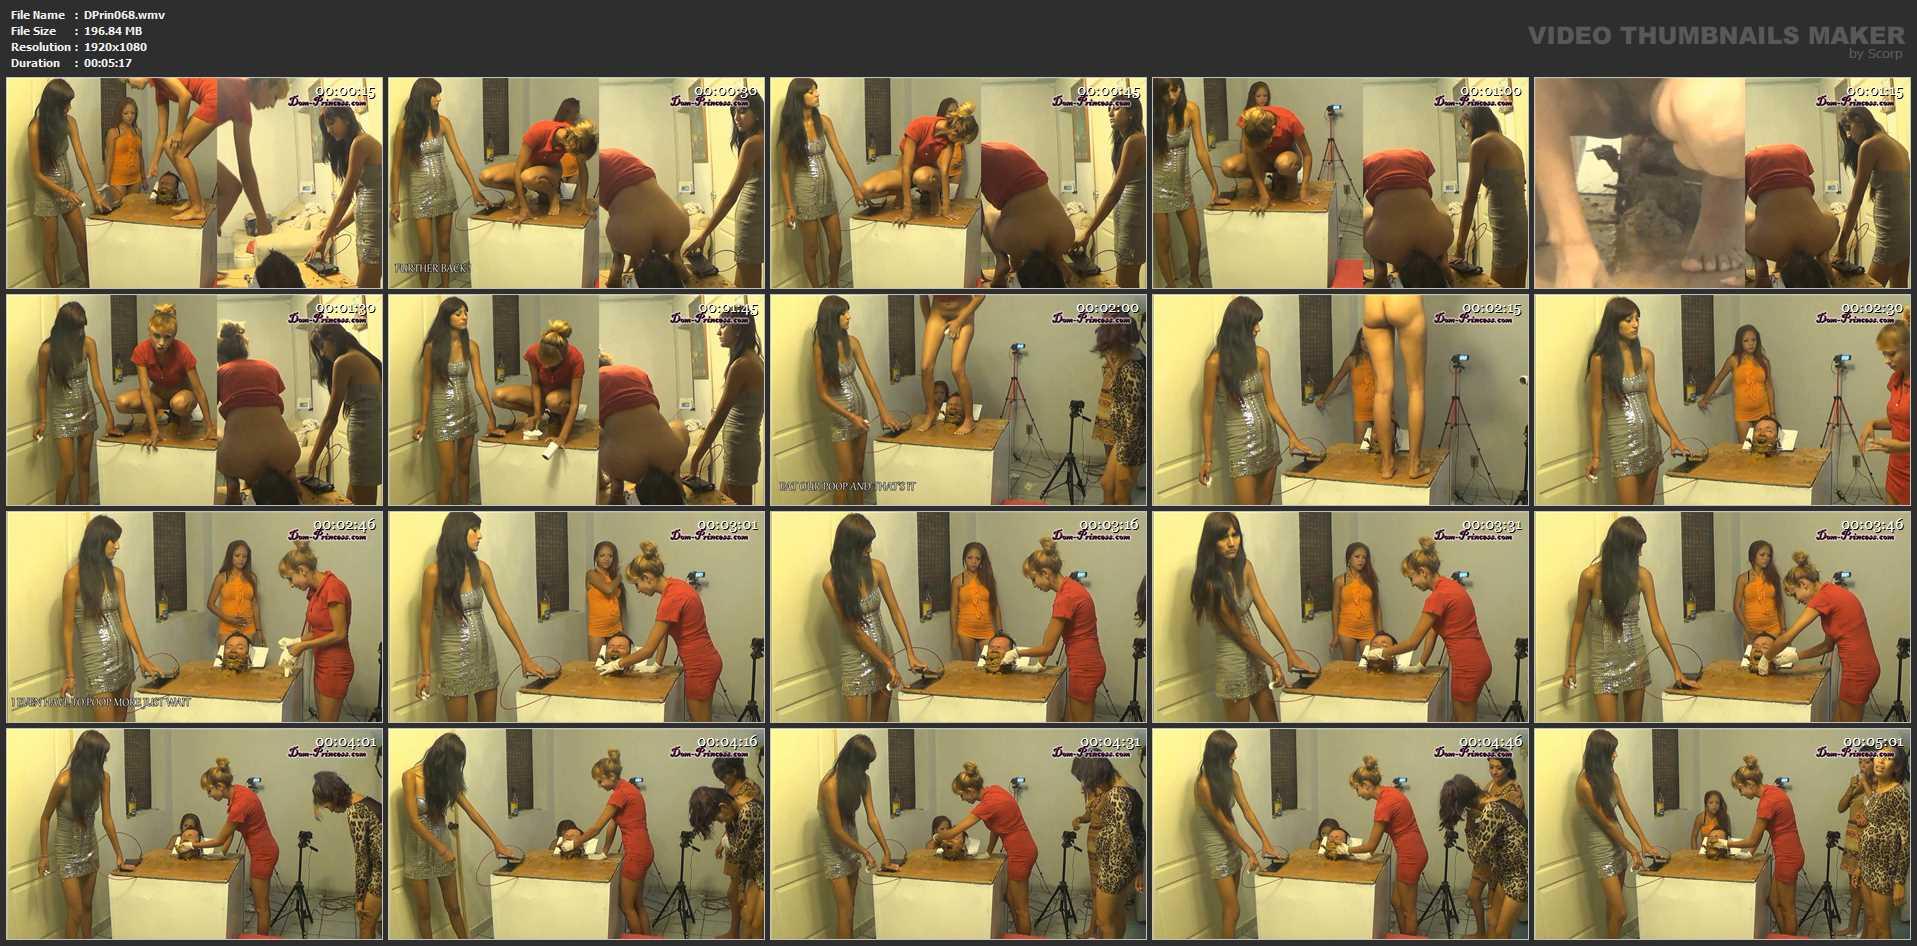 [DOM-PRINCESS] The Washing Machine Part 4 Inka [FULL HD][1080p][WMV]